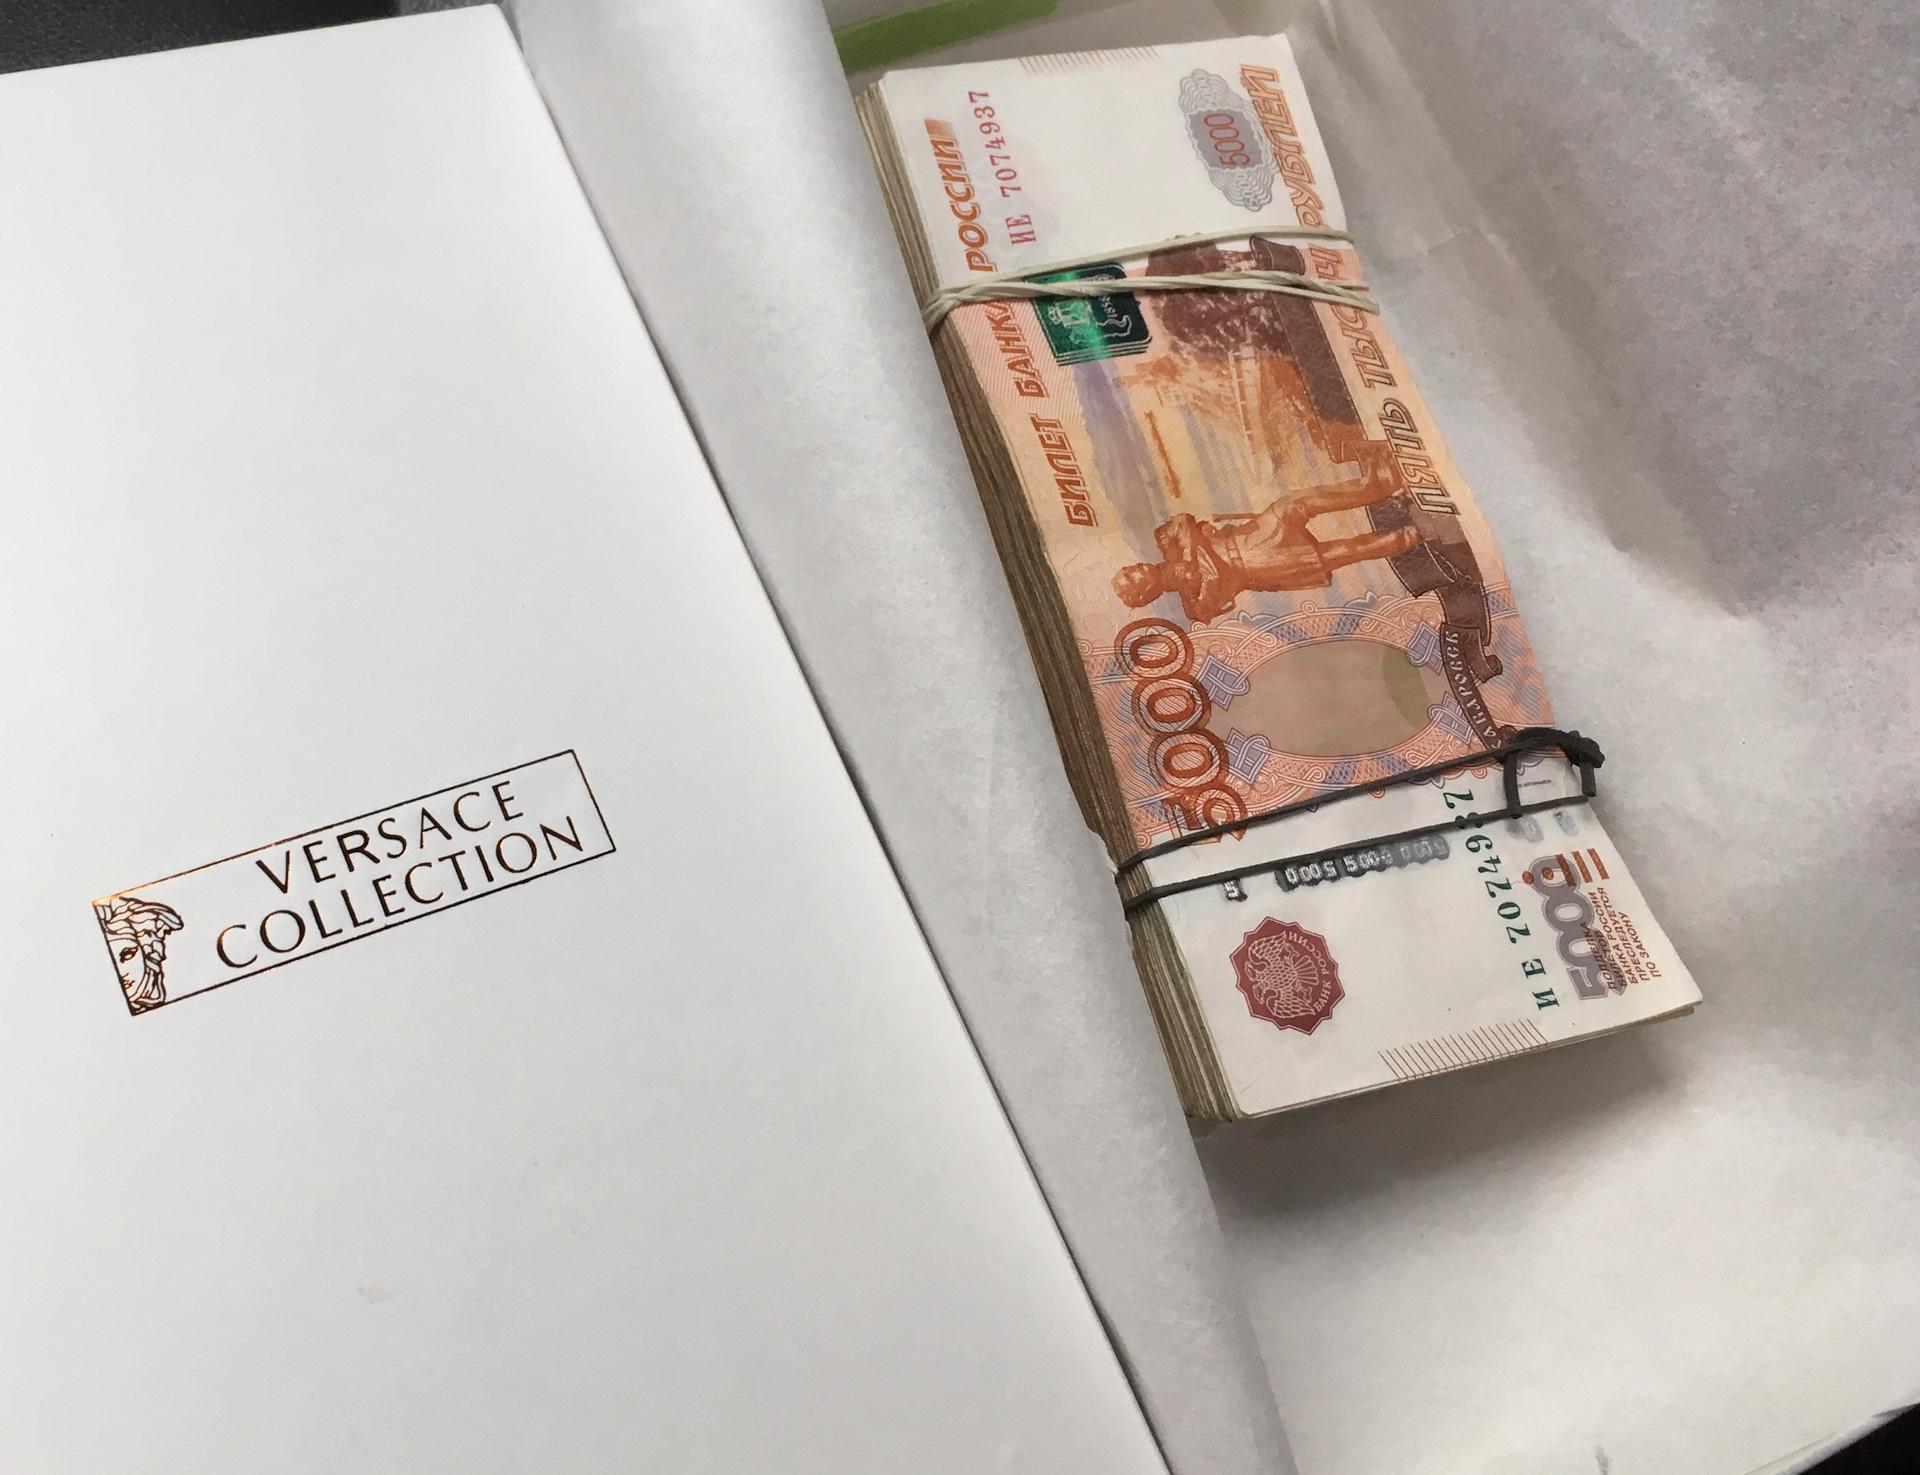 узнать баланс карточки беларусбанк онлайн